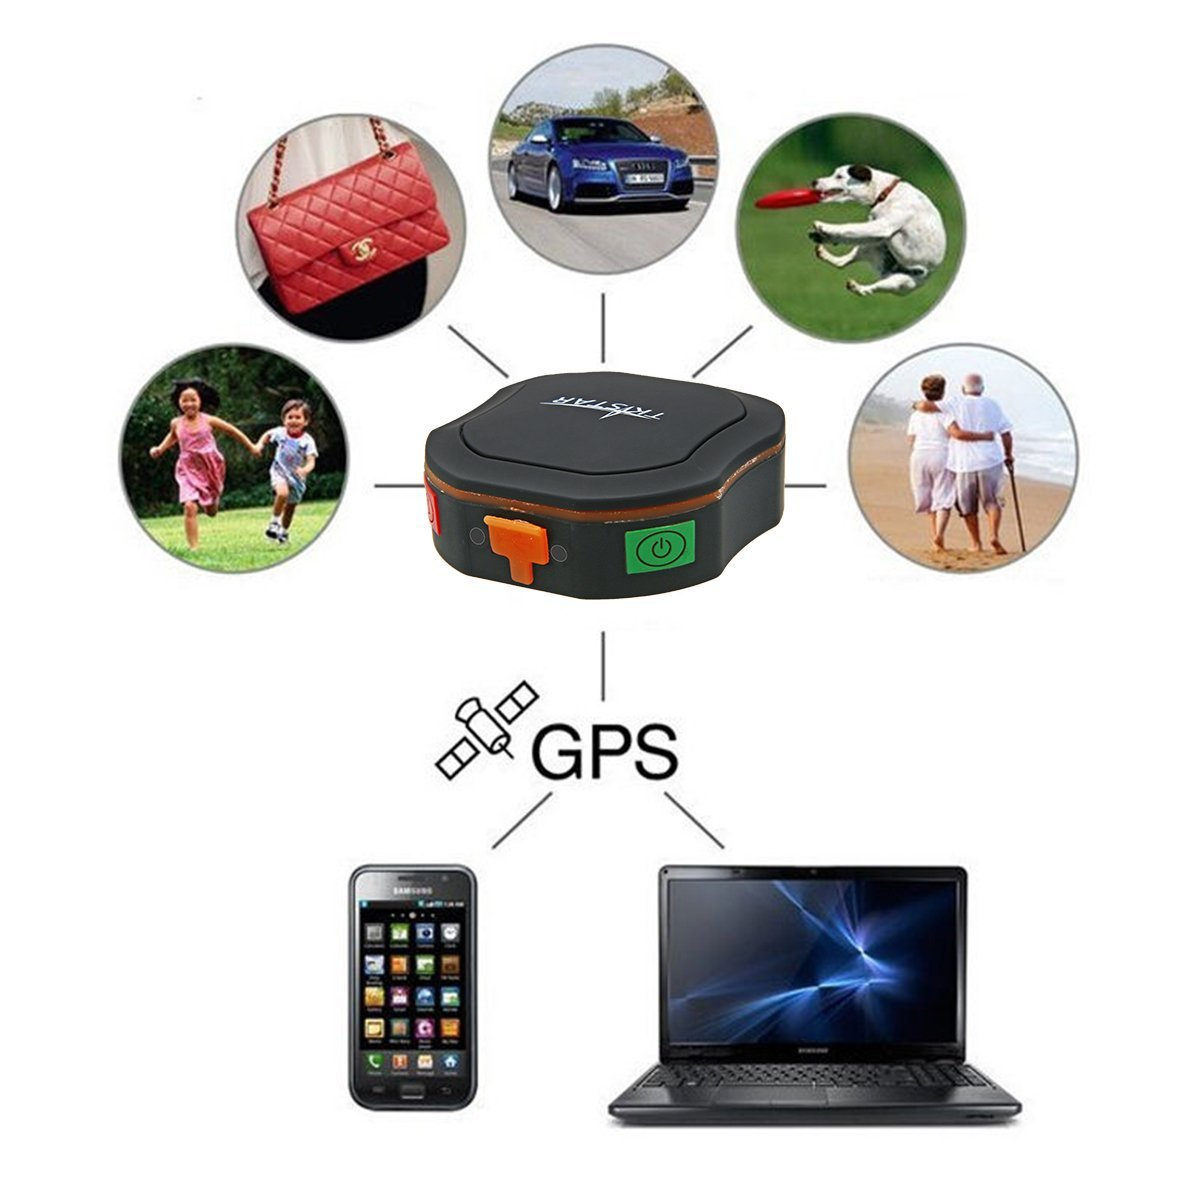 mini auto berwachung gprs gps kfz kinder echtzeit tracker. Black Bedroom Furniture Sets. Home Design Ideas